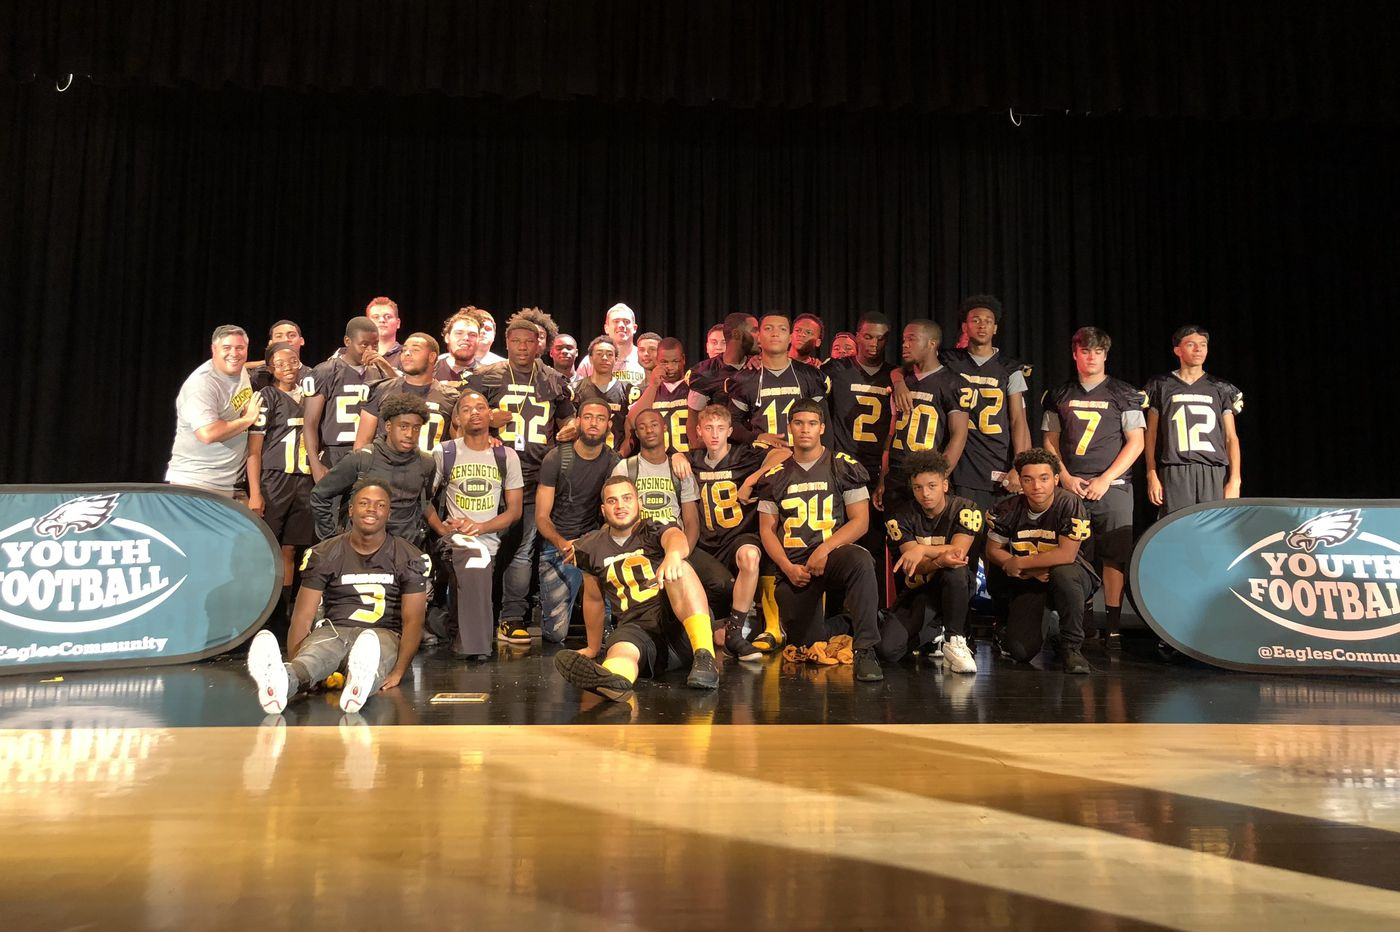 Eagles, Zach Ertz gift equipment to Kensington High School and 'Wolves Youth' football program